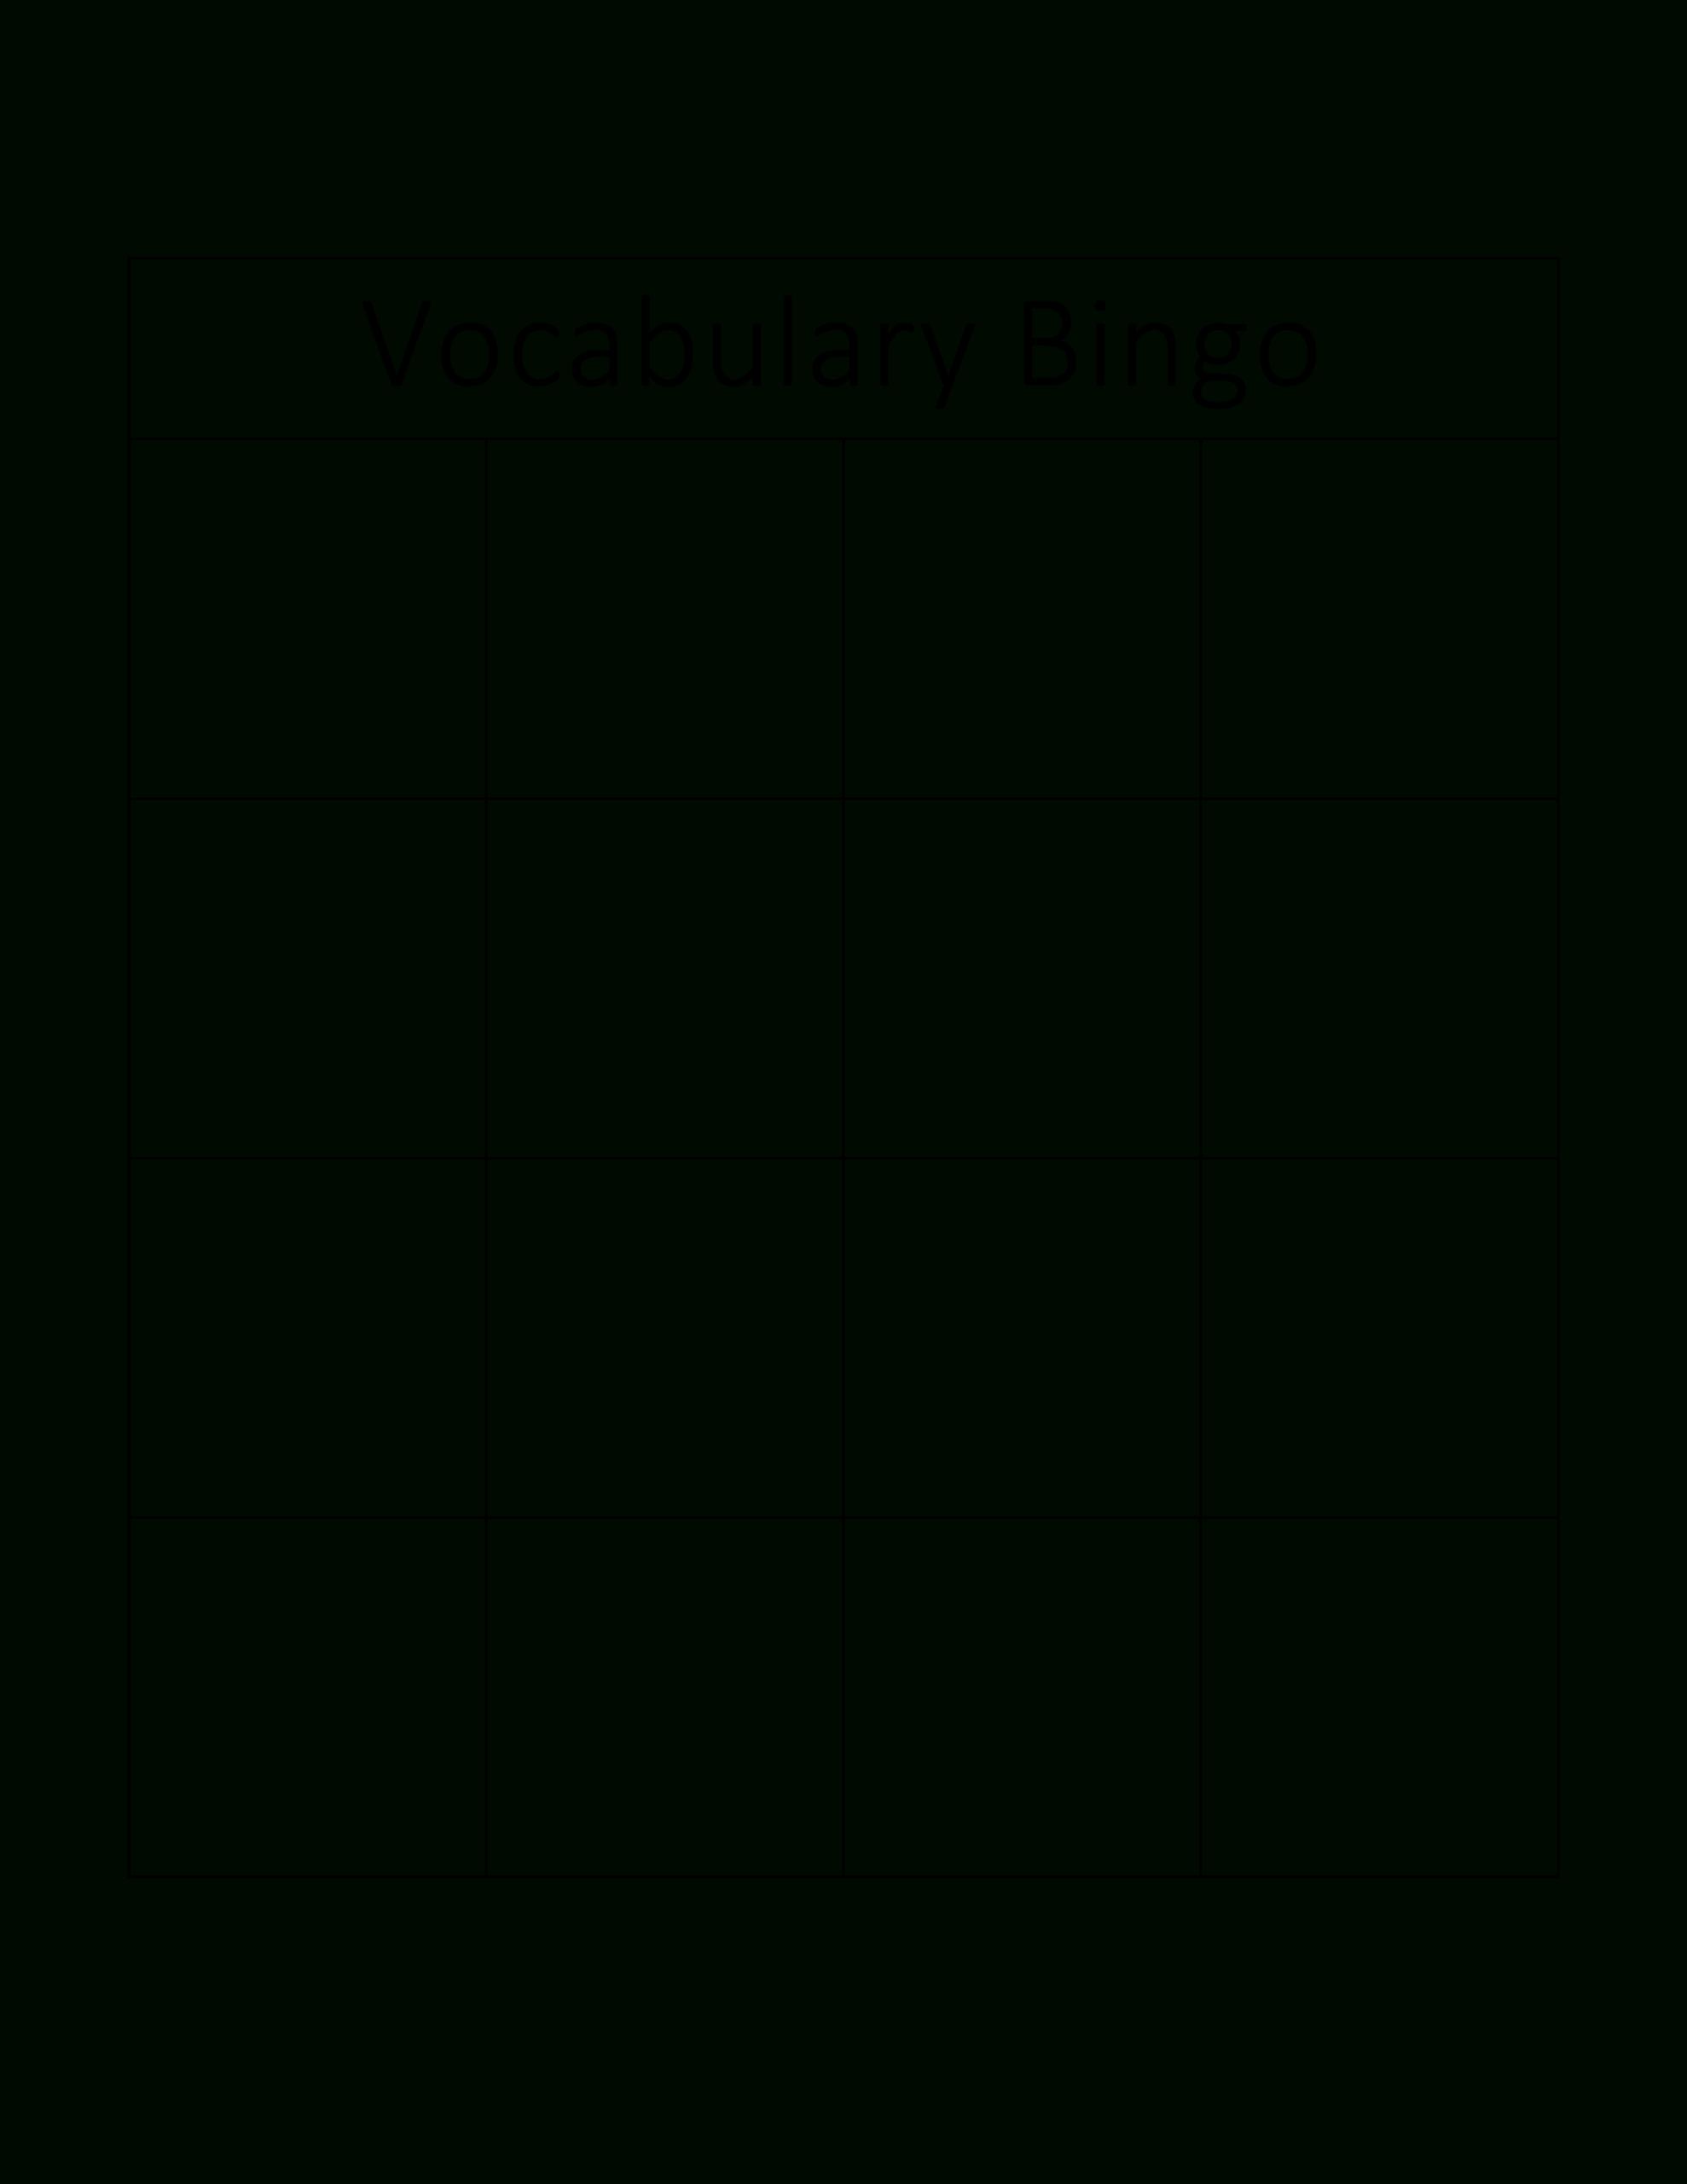 Kostenloses Vocabulary Bingo Card In Blank Bingo Card Template Microsoft Word